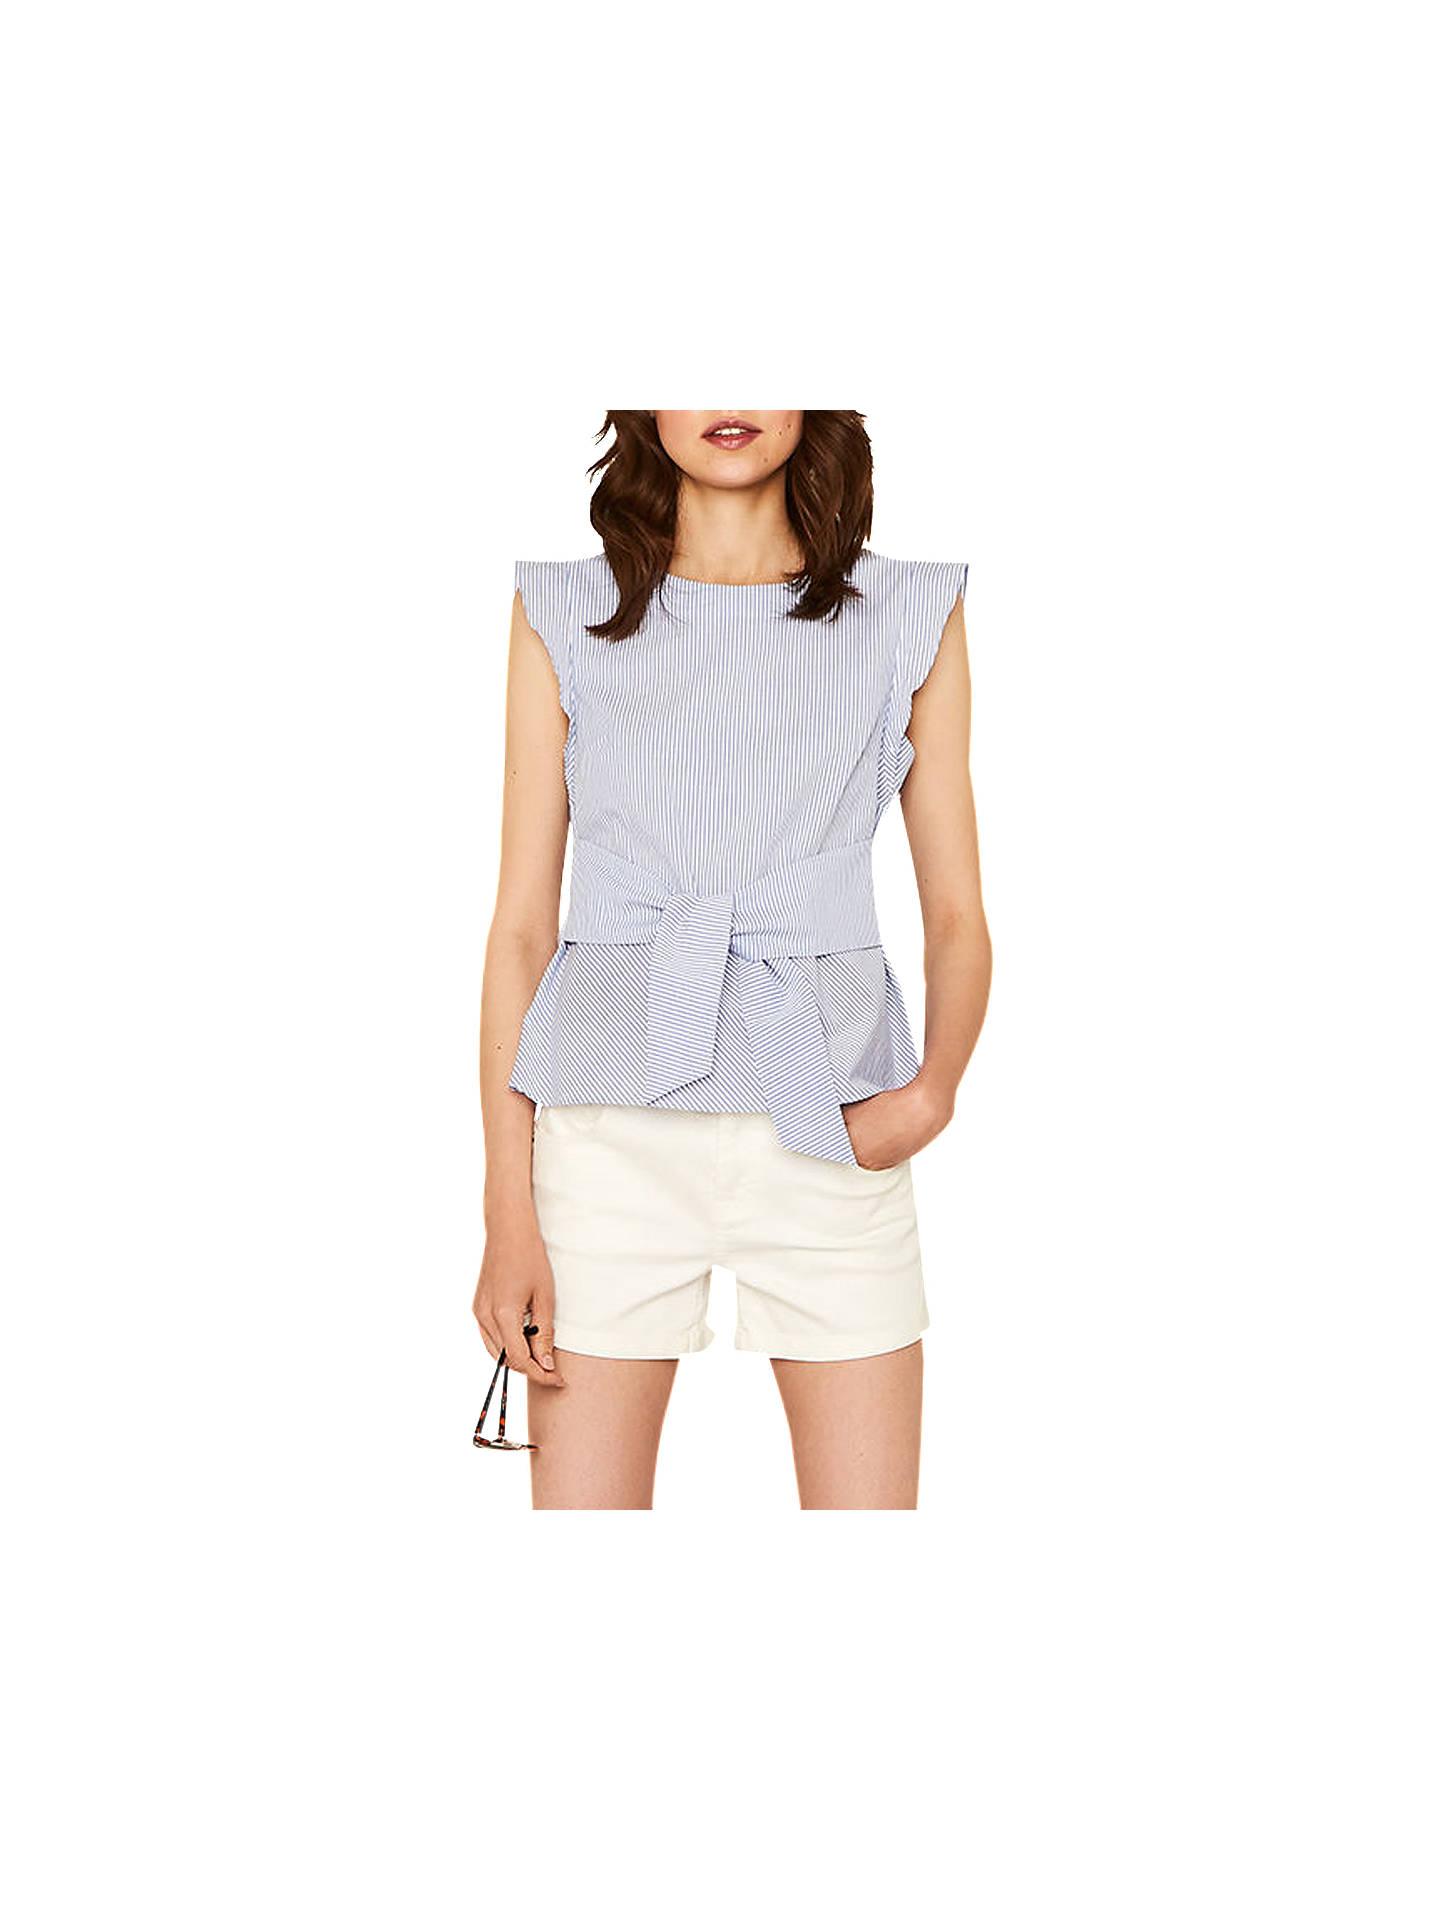 43fee0327a7d Buy Oasis Ticking Stripe Top, Blue, 8 Online at johnlewis.com ...